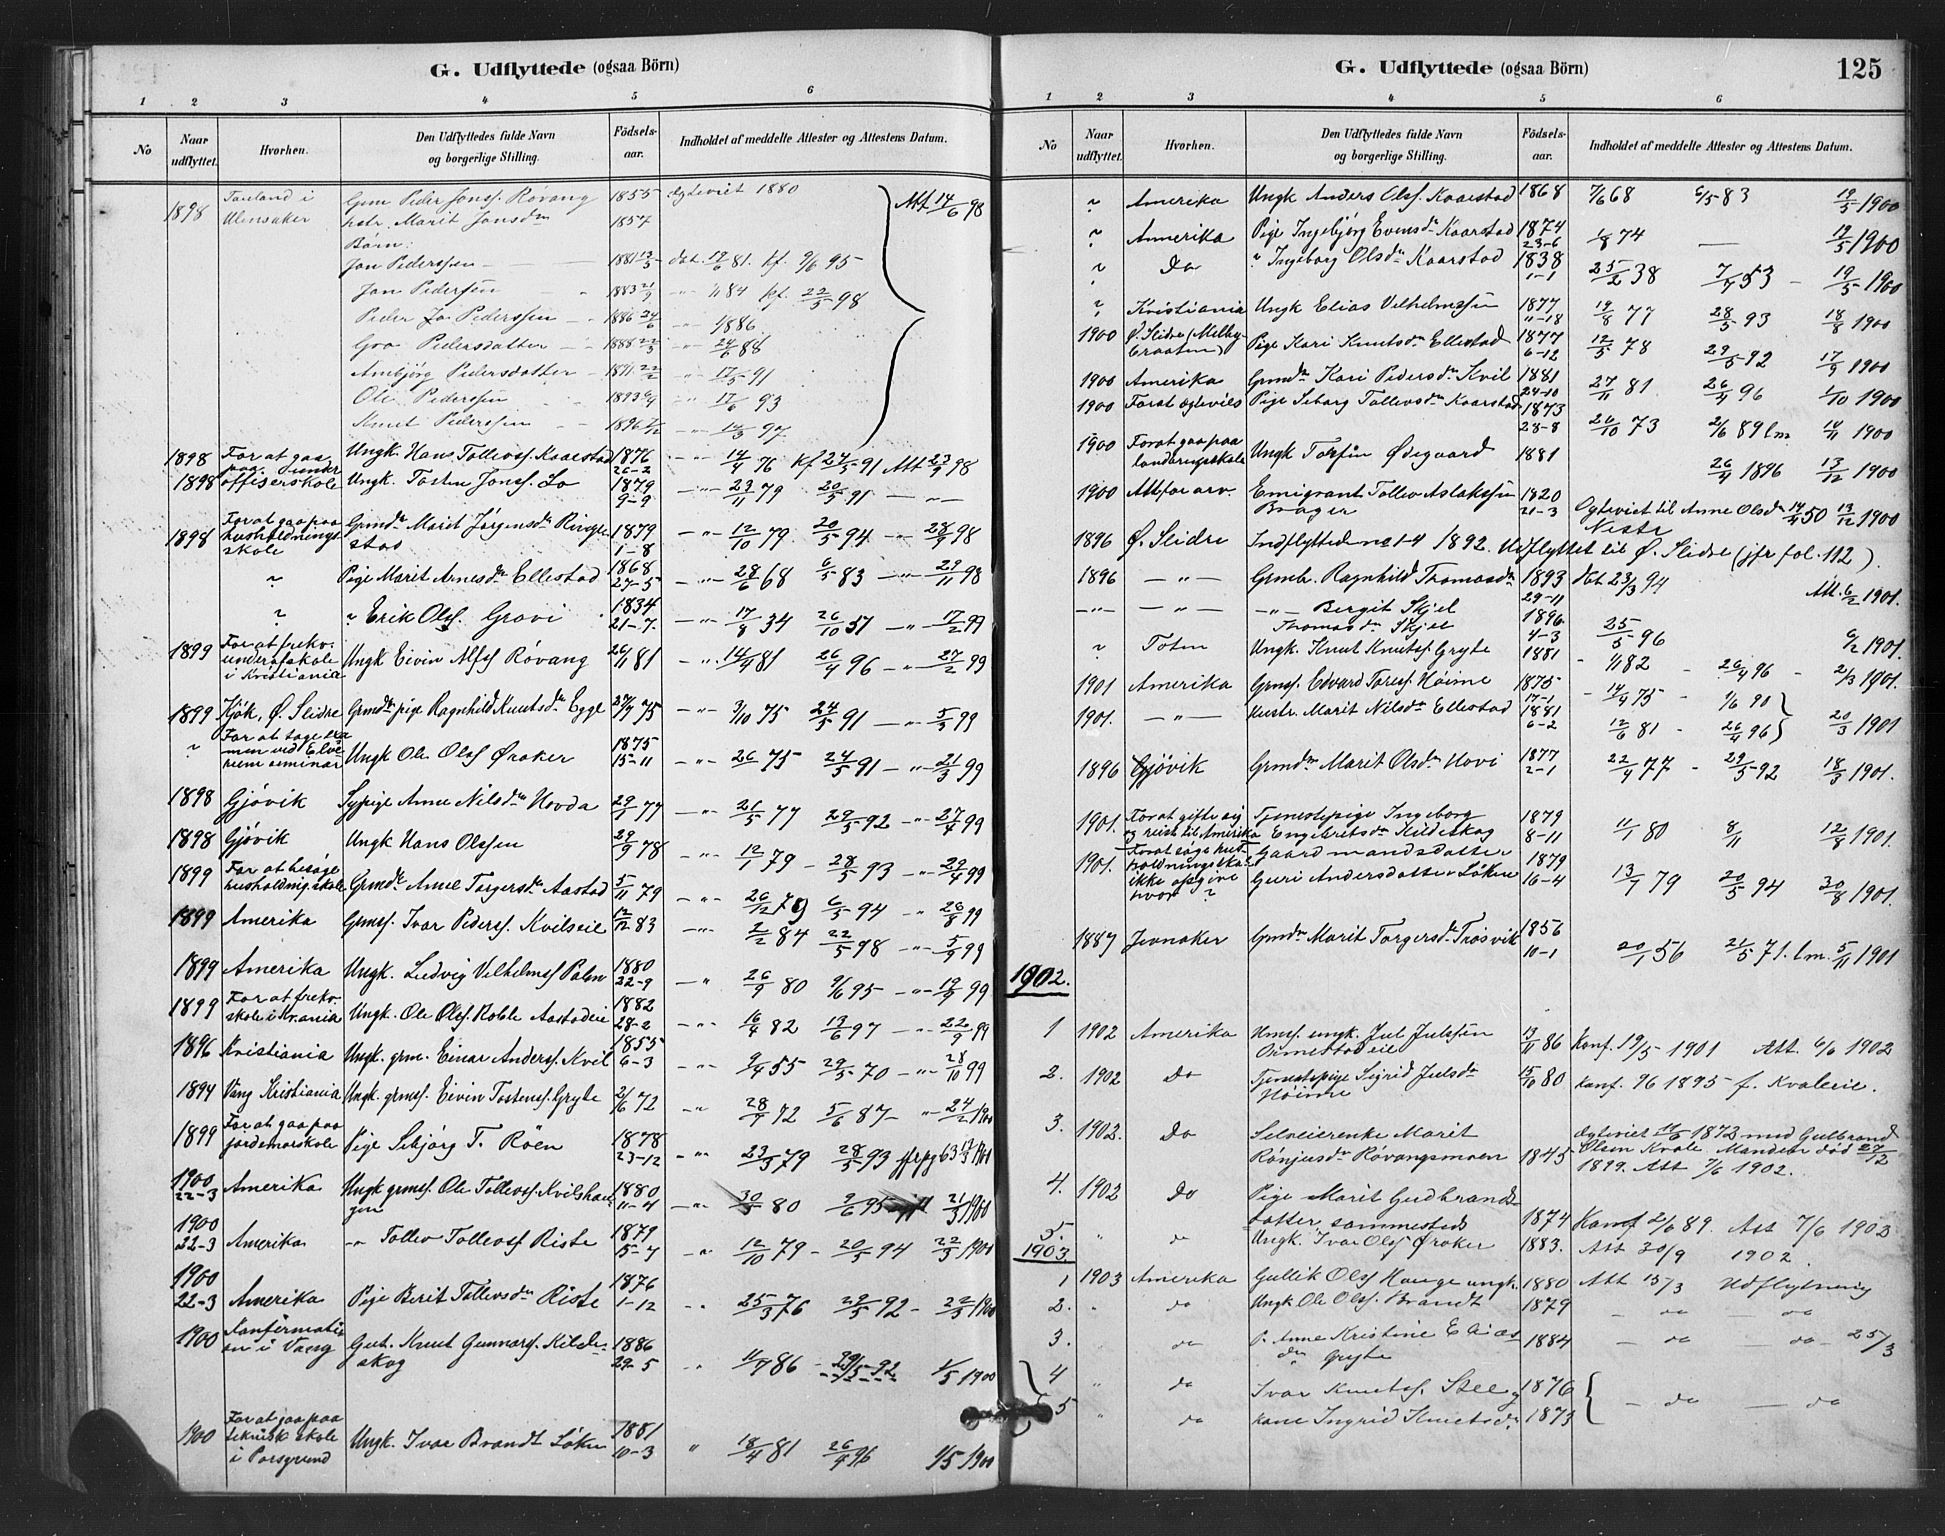 SAH, Vestre Slidre prestekontor, Klokkerbok nr. 6, 1881-1915, s. 125